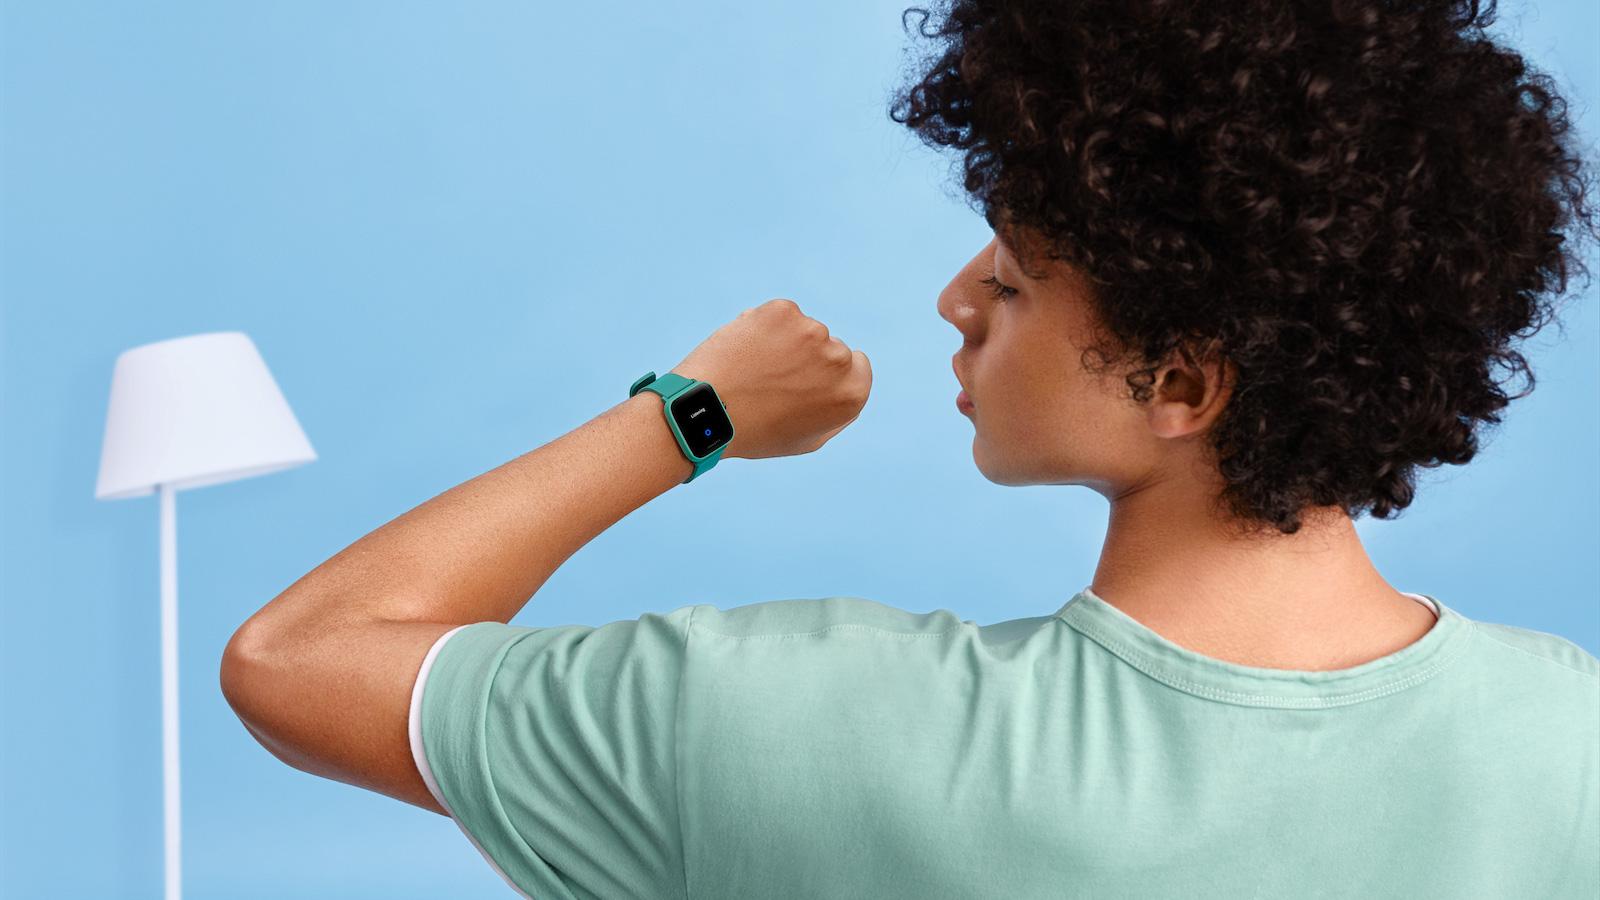 Amazfit Bip U Series smart fitness watches support stress monitoring